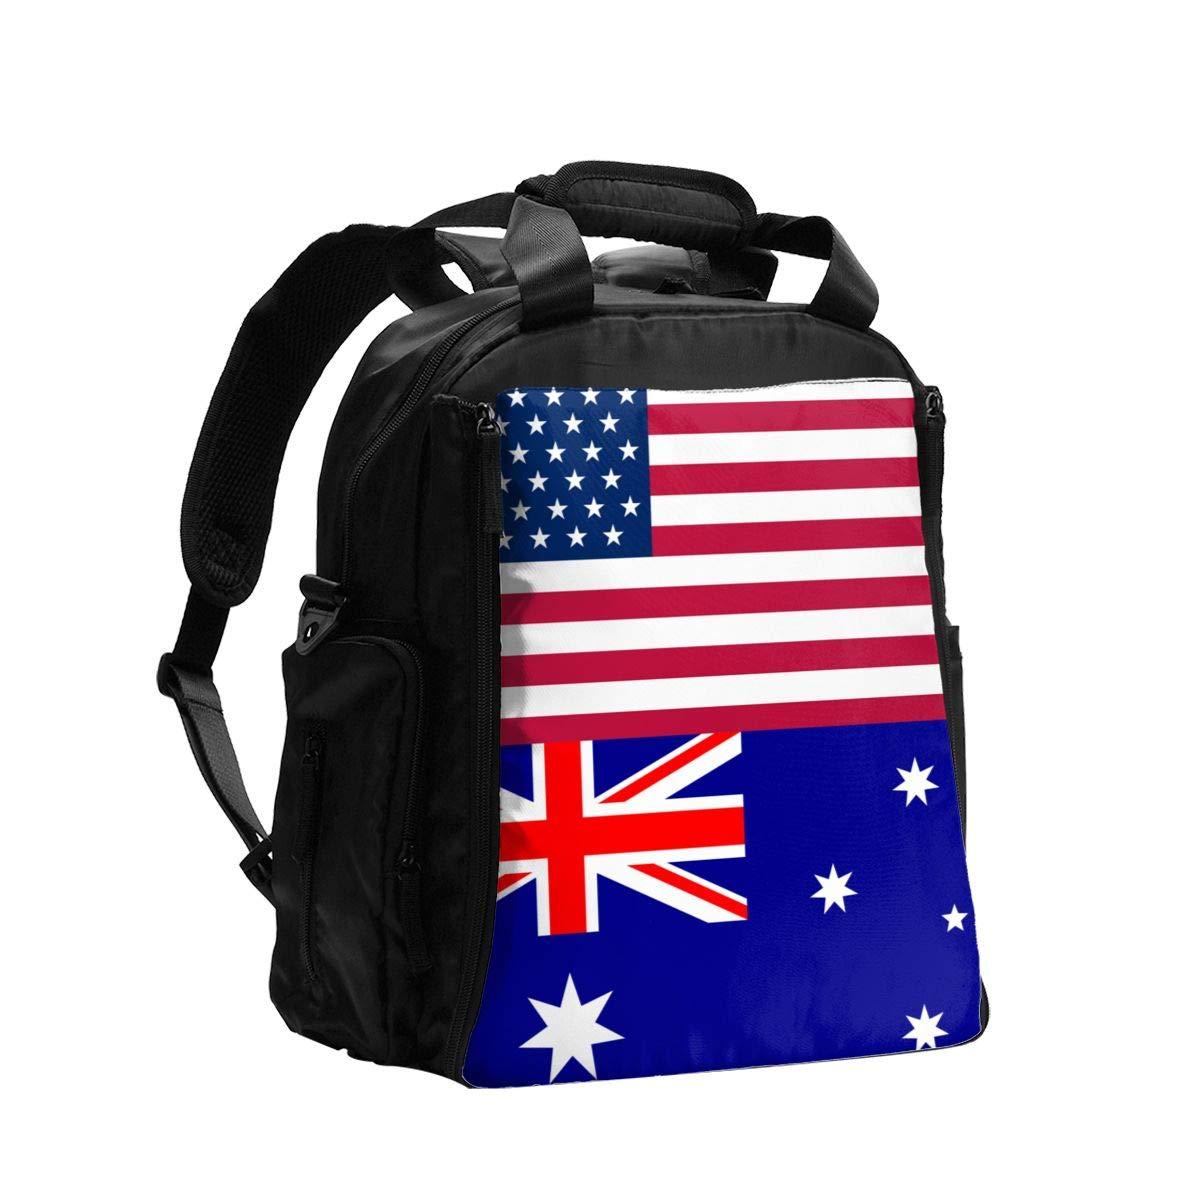 USA Australia Flag Diaper Bag Backpack Travel Backpack Maternity Baby Changing Bags